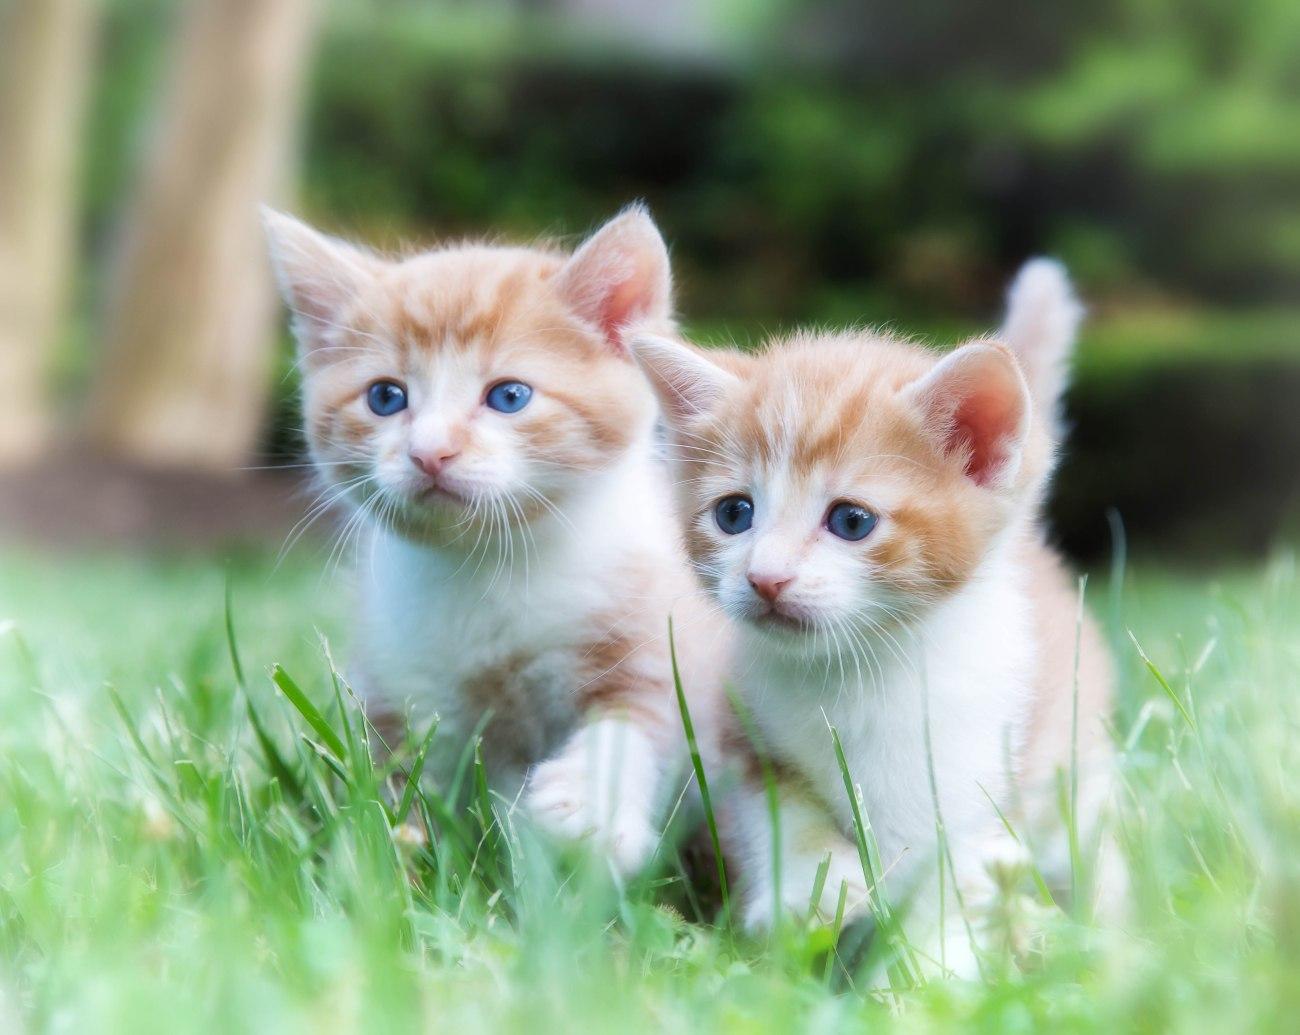 Kittens2jun14-3786-Edit